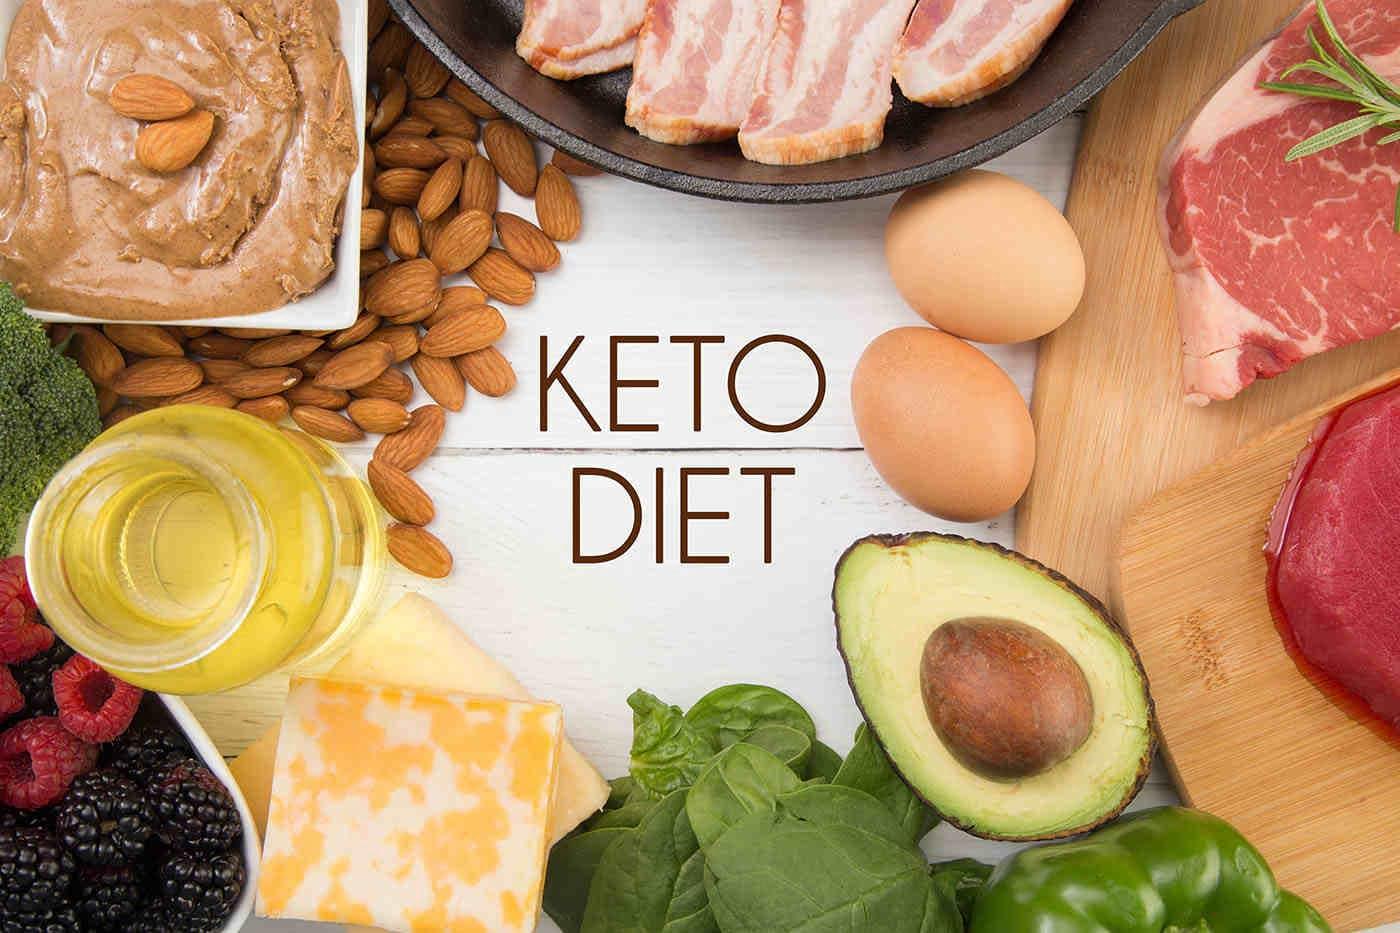 Simptomele menopauzei ar putea fi ușurate cu dieta keto?